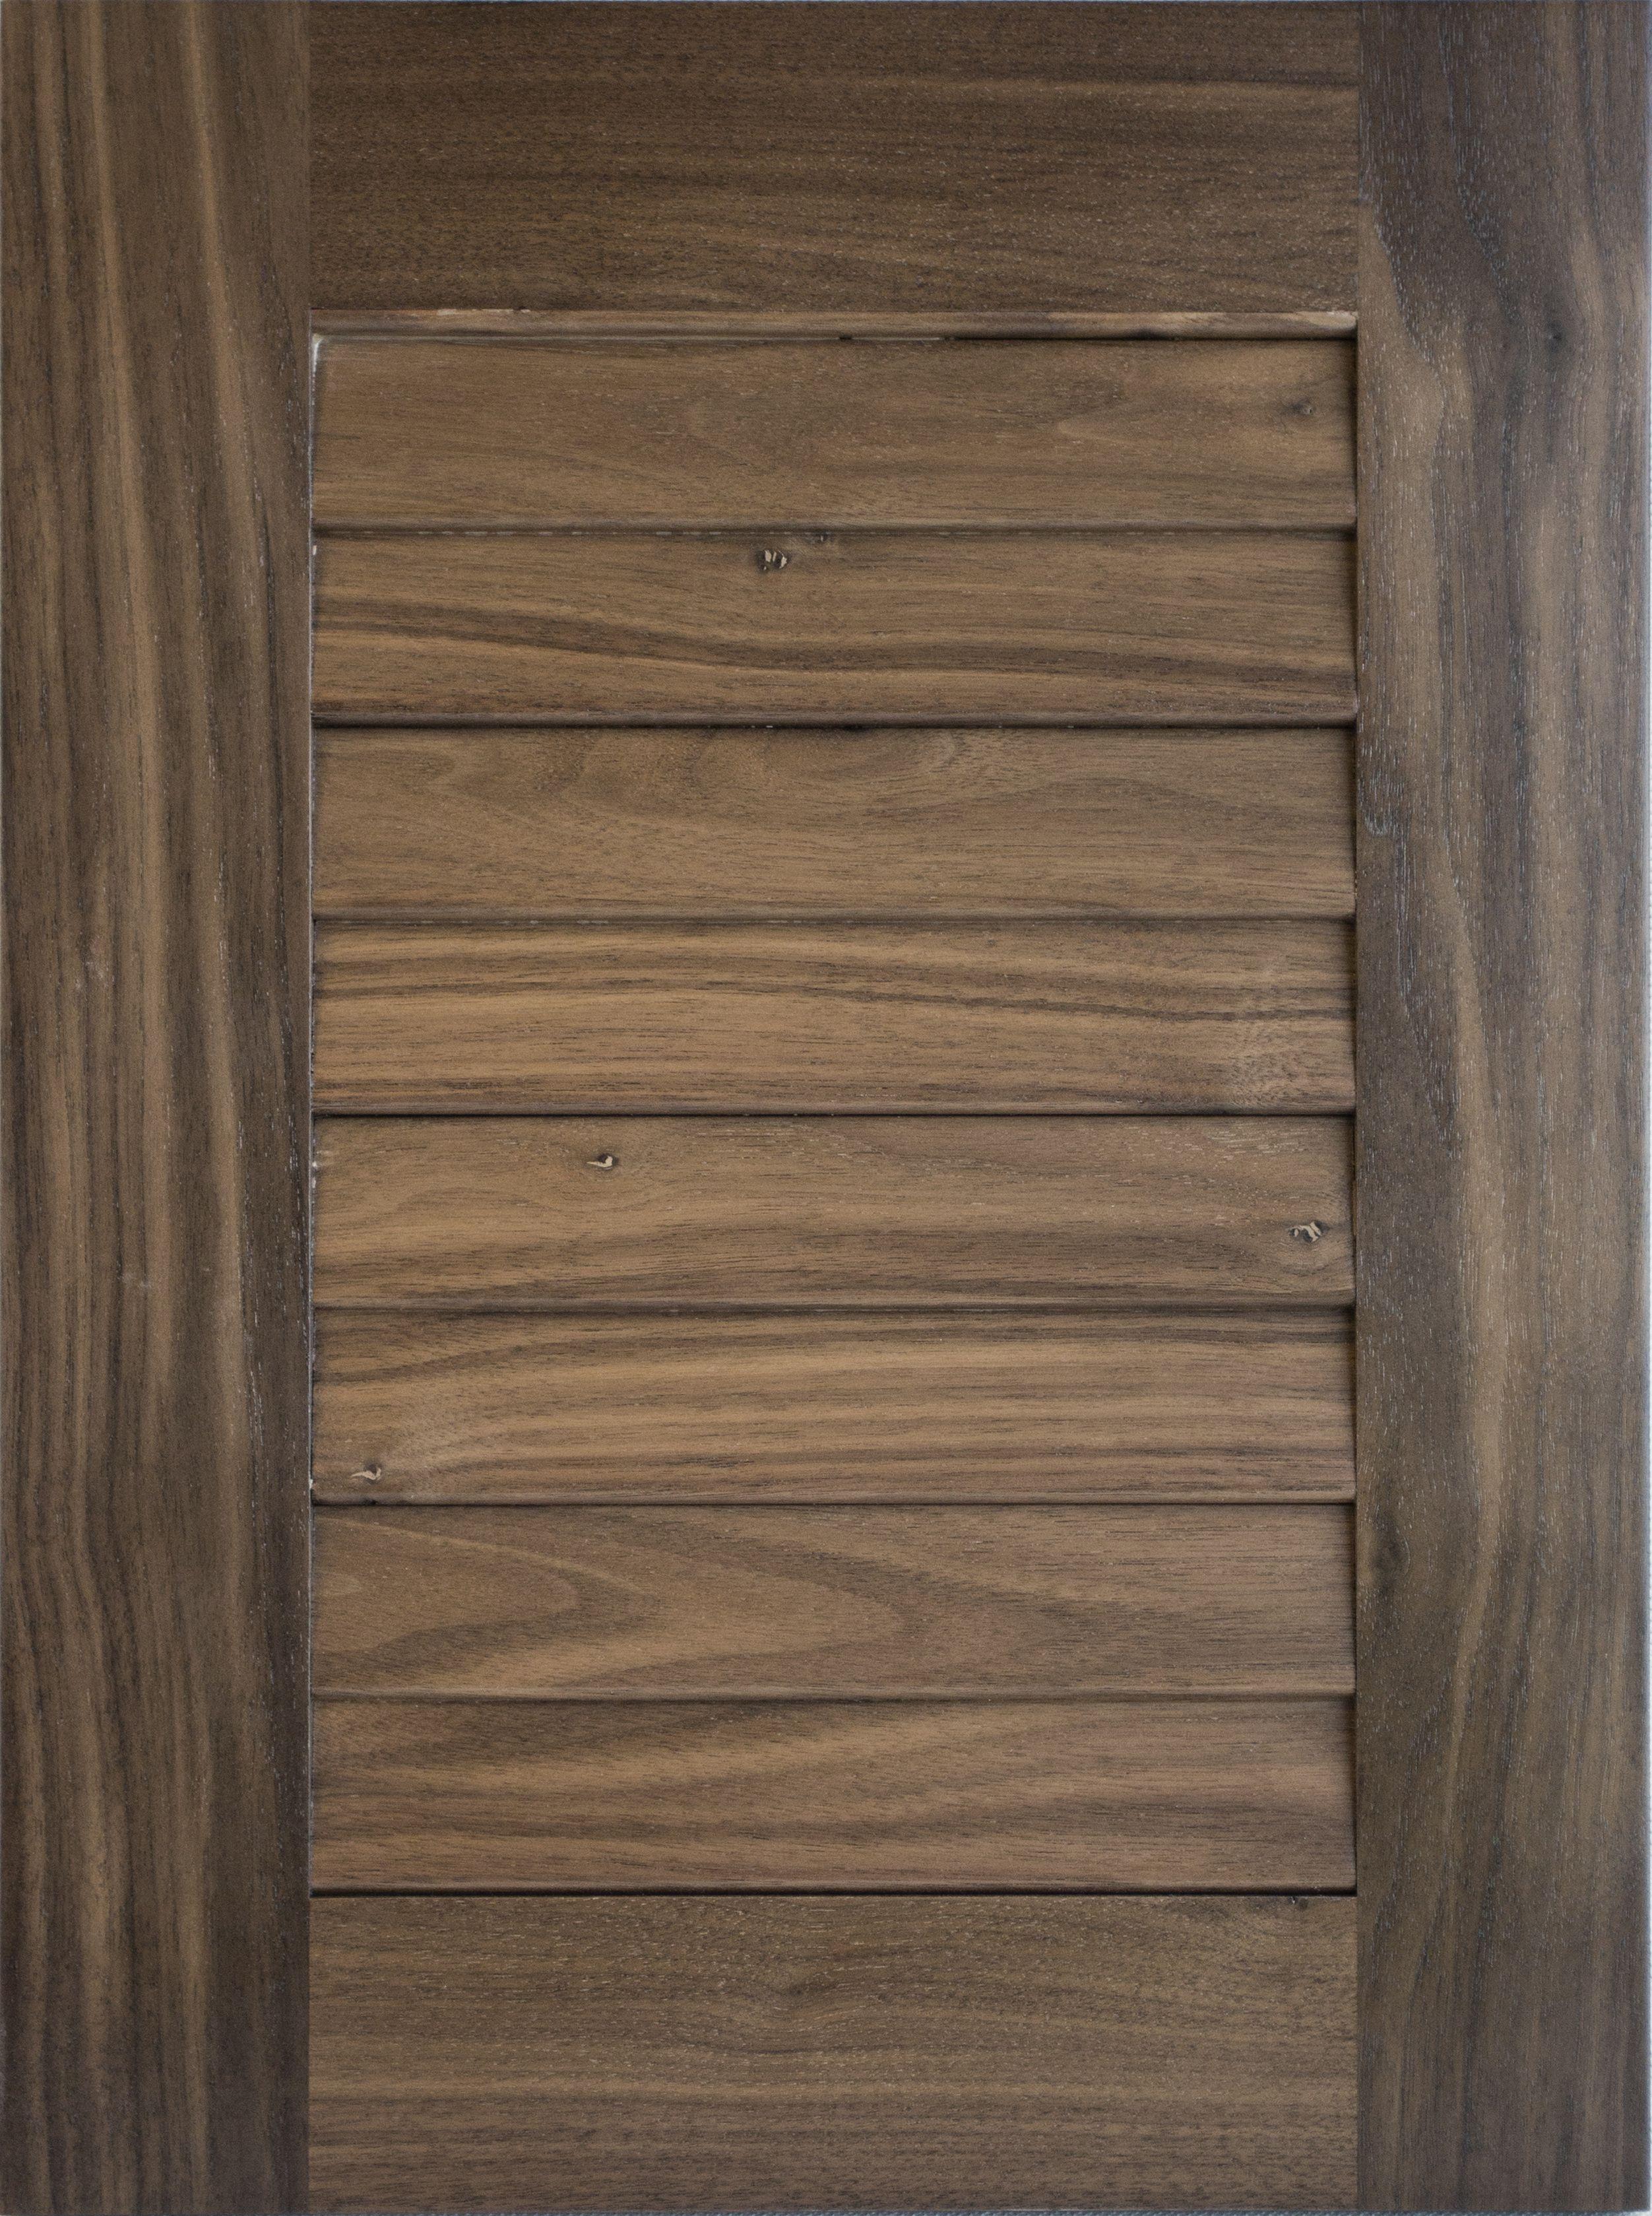 Prime New Custom Louvered Door In Black Walnut In Sesame Stain Download Free Architecture Designs Scobabritishbridgeorg